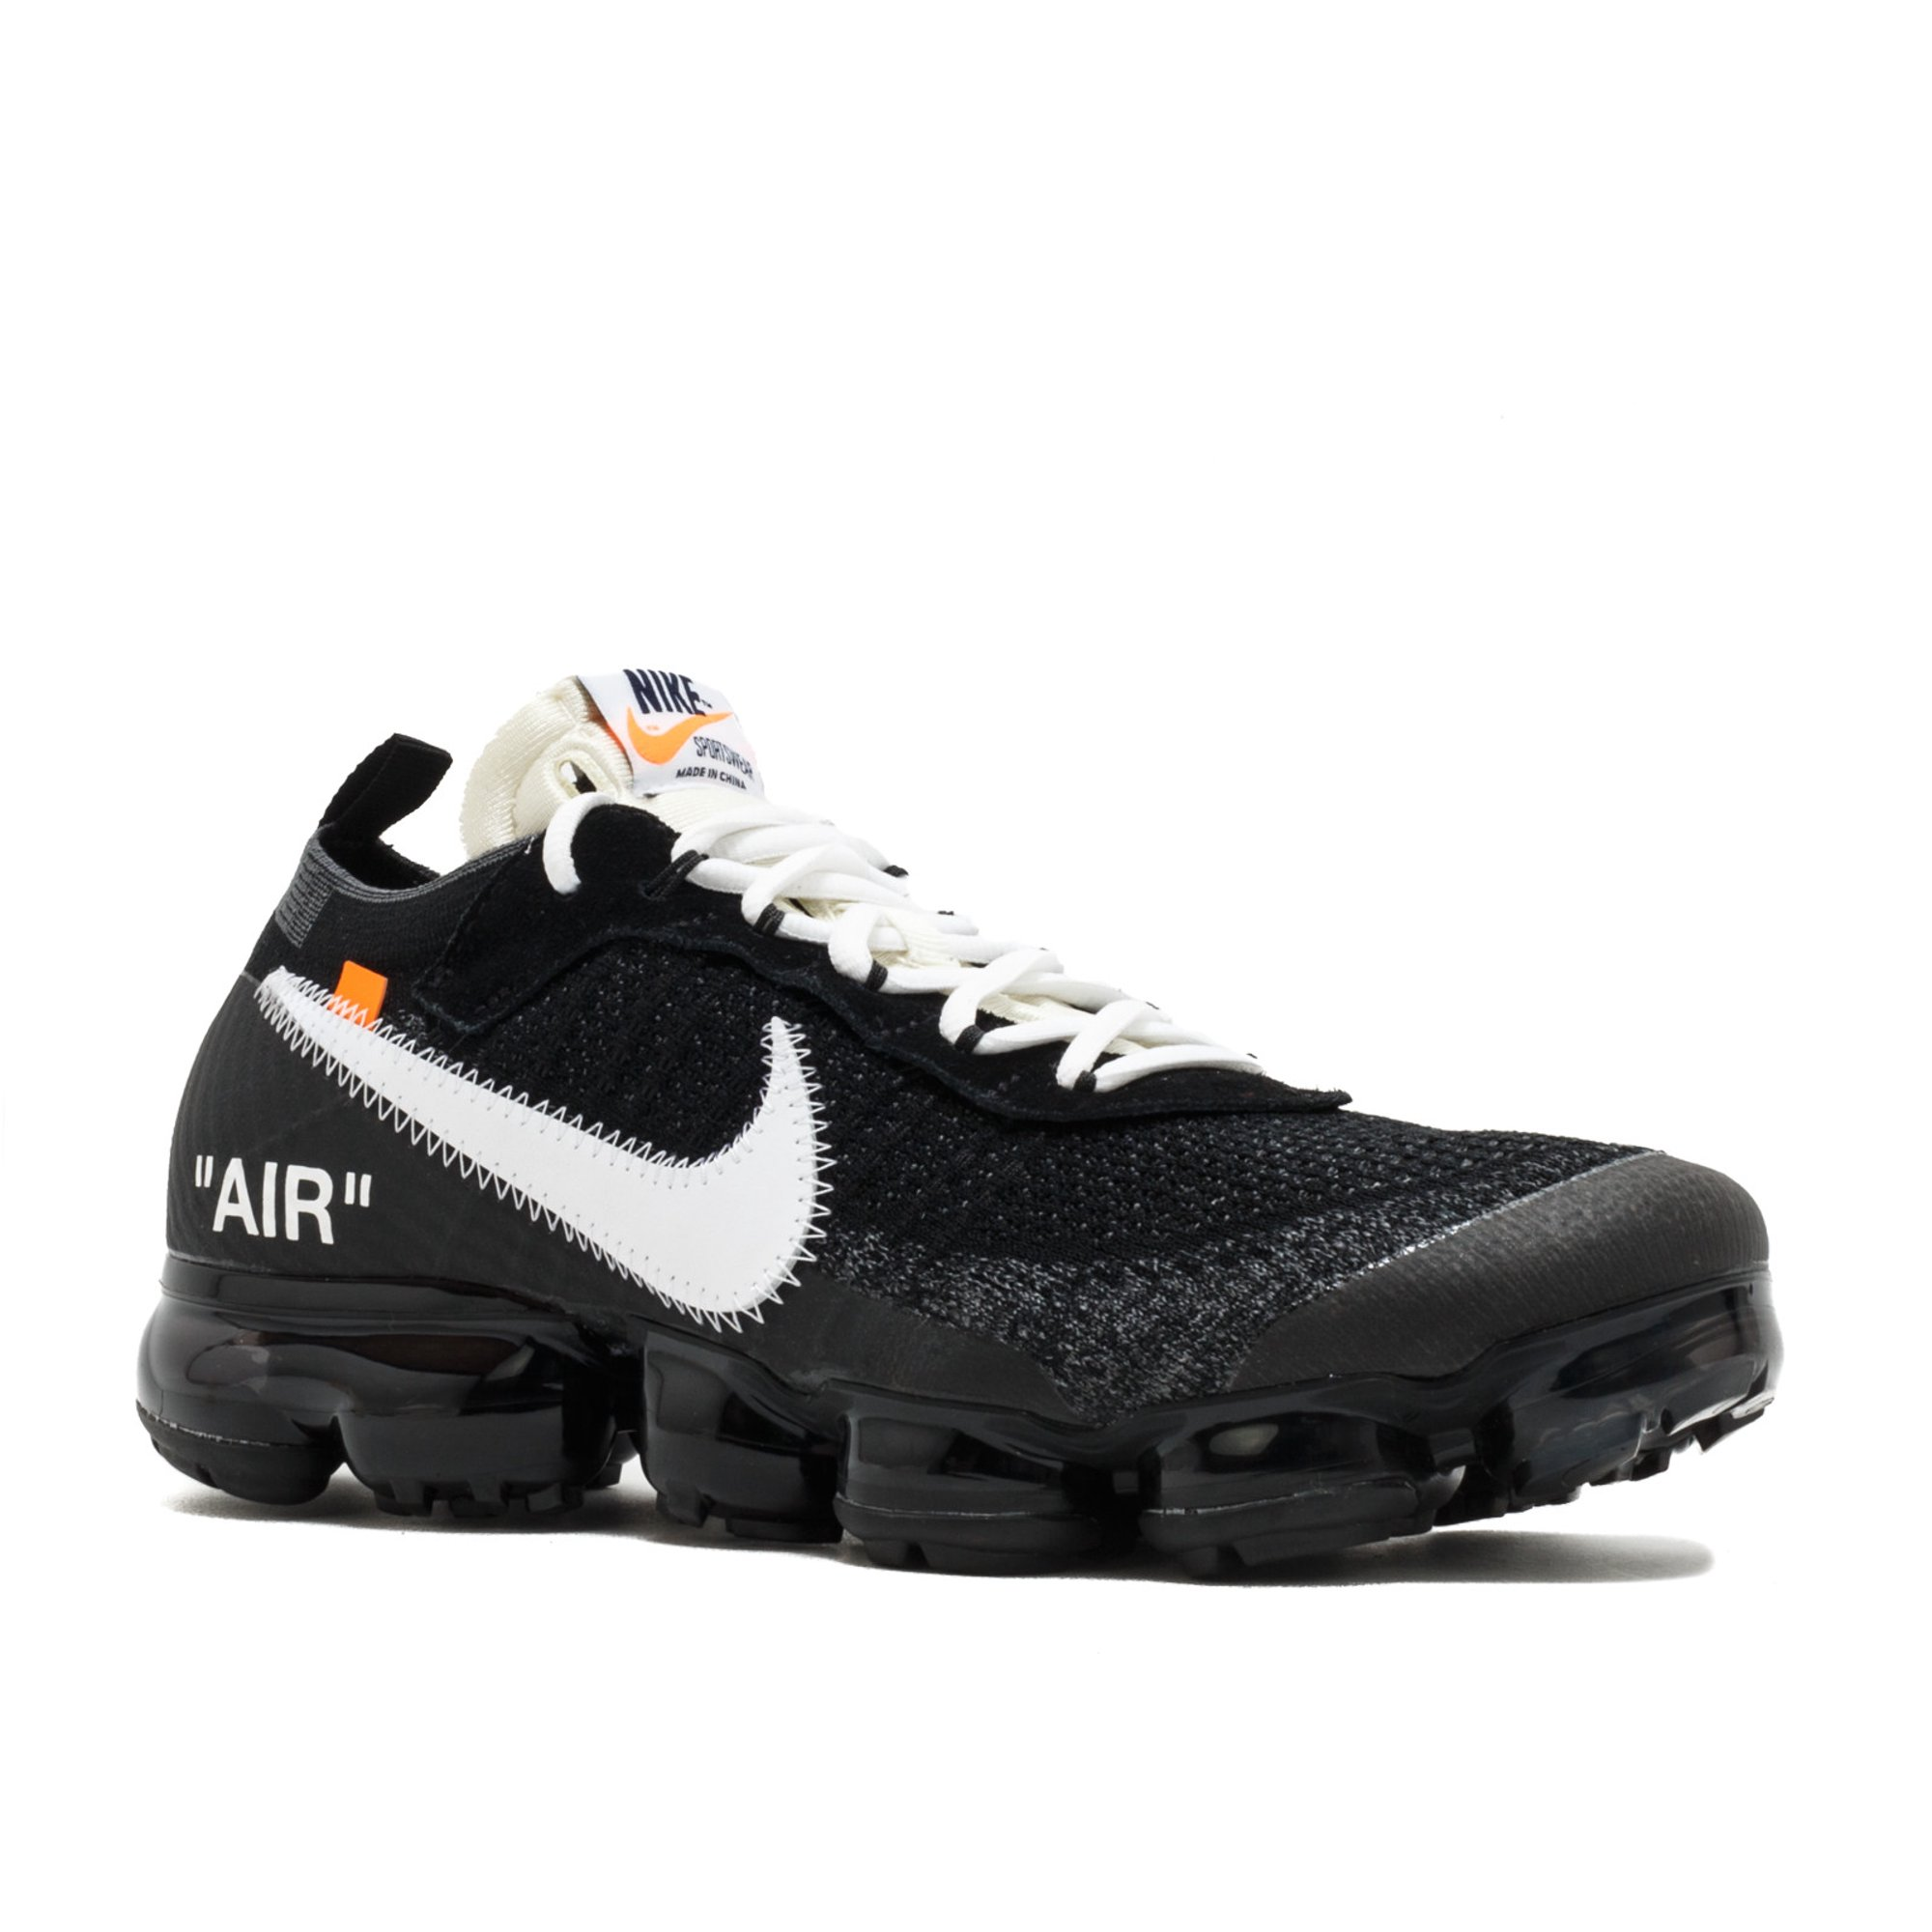 9460daa9735 Nike - Men - The 10  Nike Air Vapormax Fk  Off-White  - Aa3831-001 - Size  11